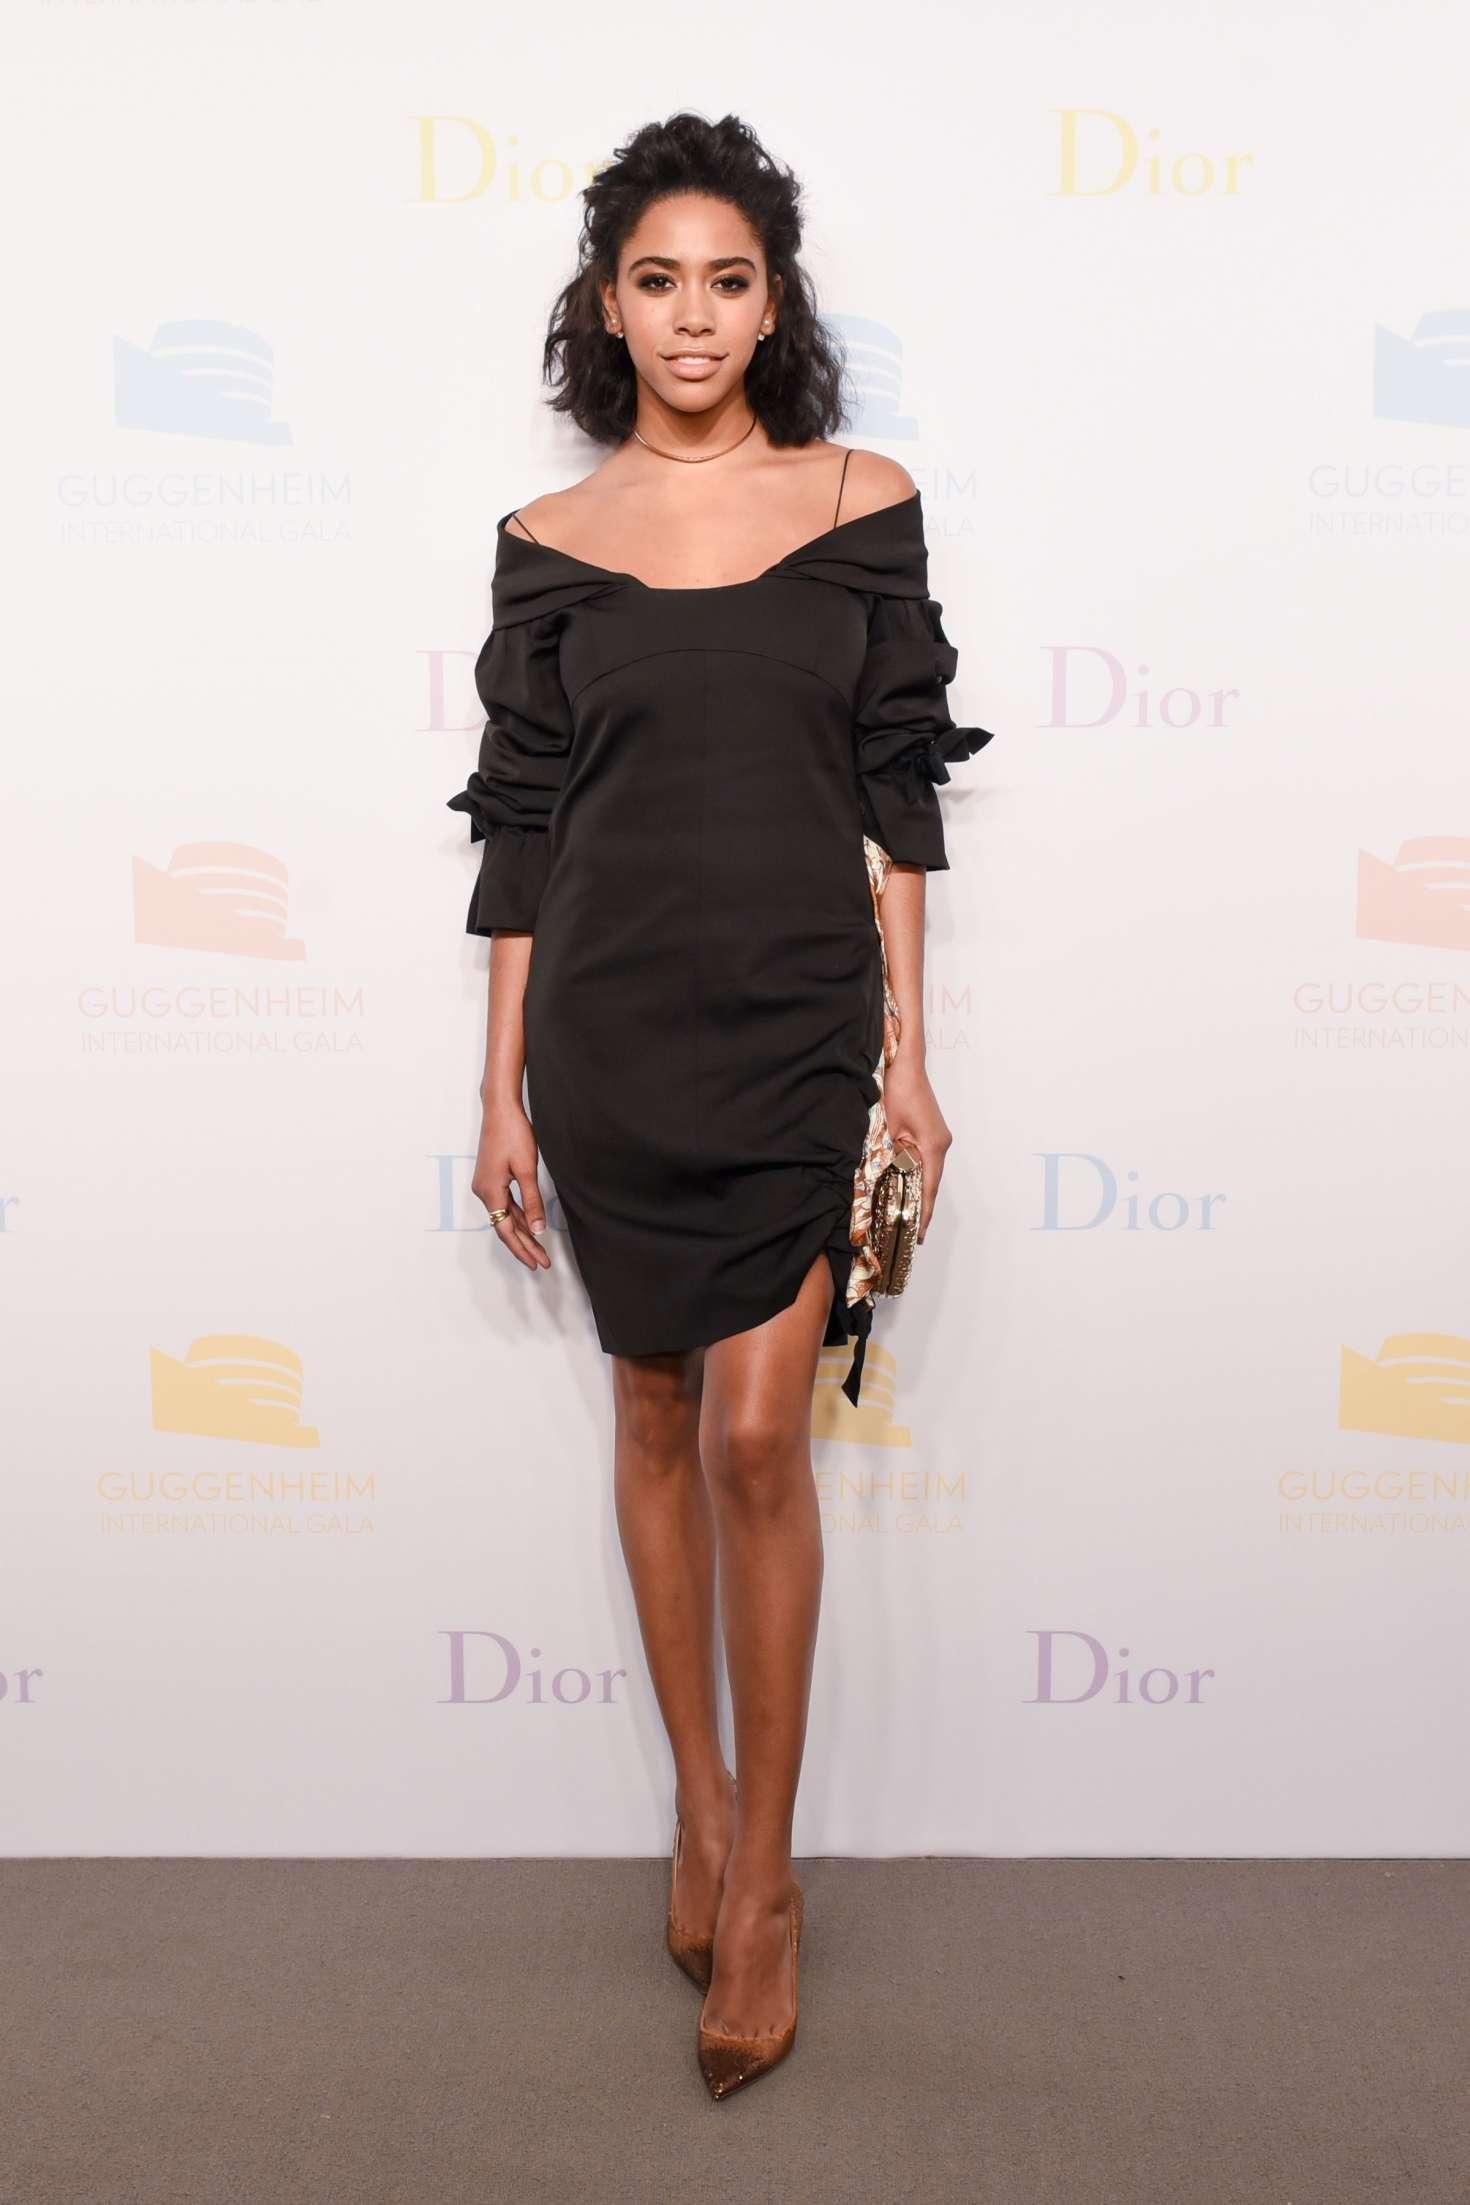 Herizen Guardiola - 2016 Guggenheim International Gala Dior Party in NYC